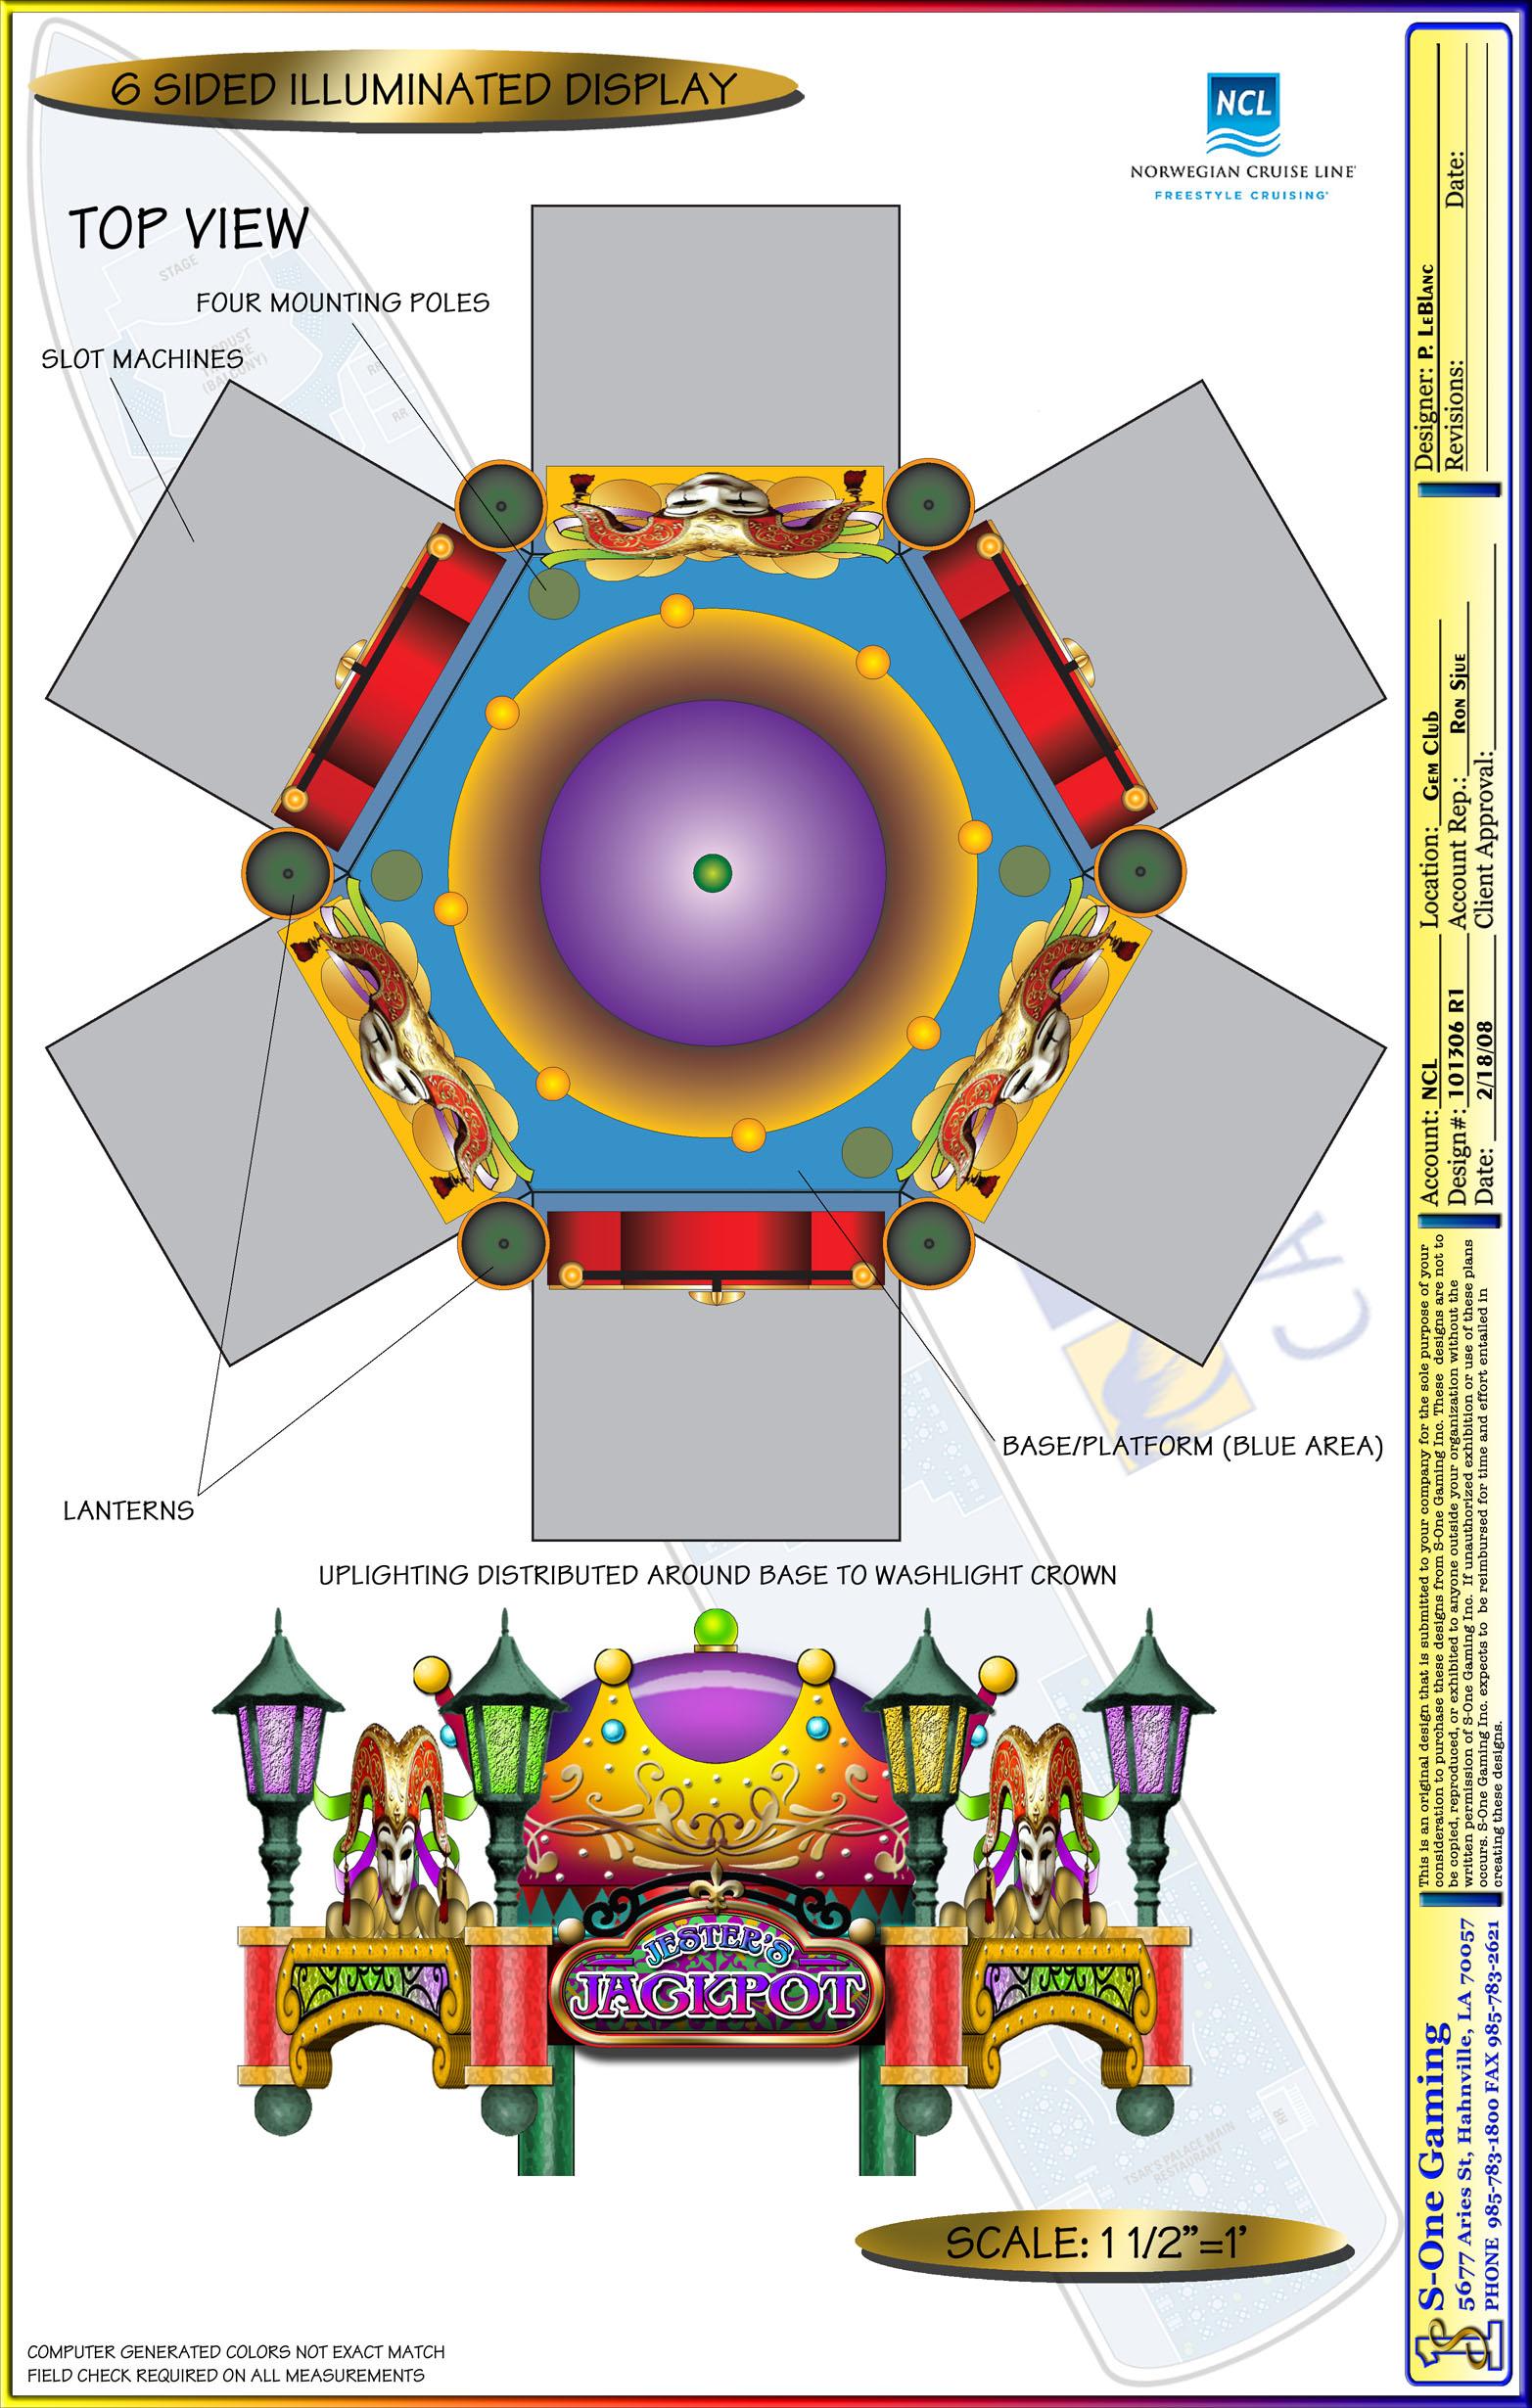 101306 R1 GEM CLUB CIRCULAR top view2.jpg